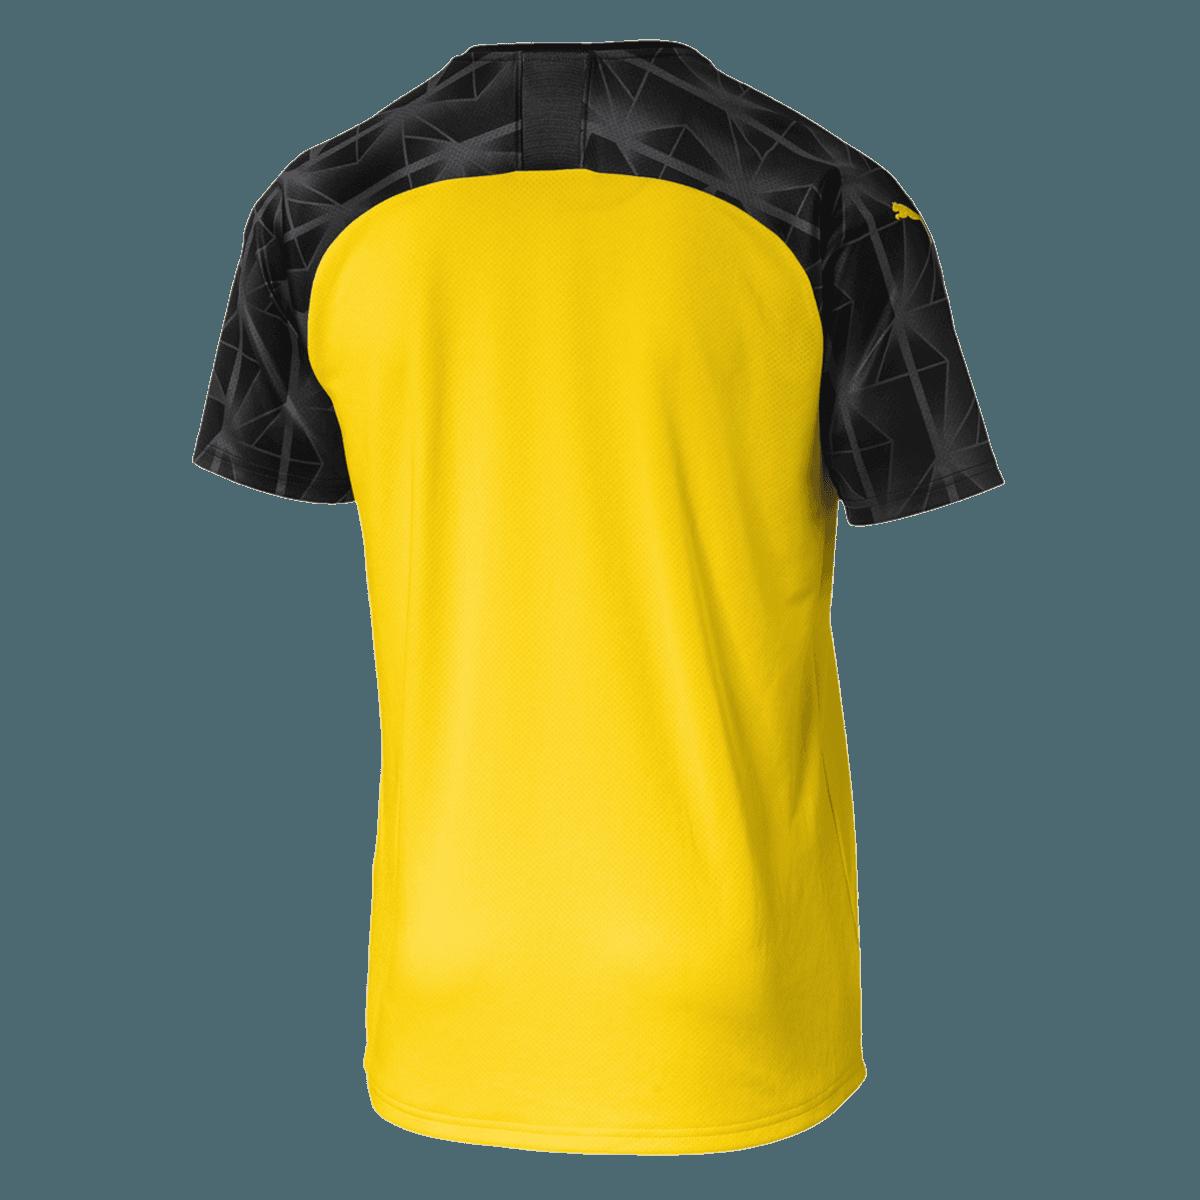 Puma BVB Herren Cup Trikot 201920 gelbschwarz Fussball Shop